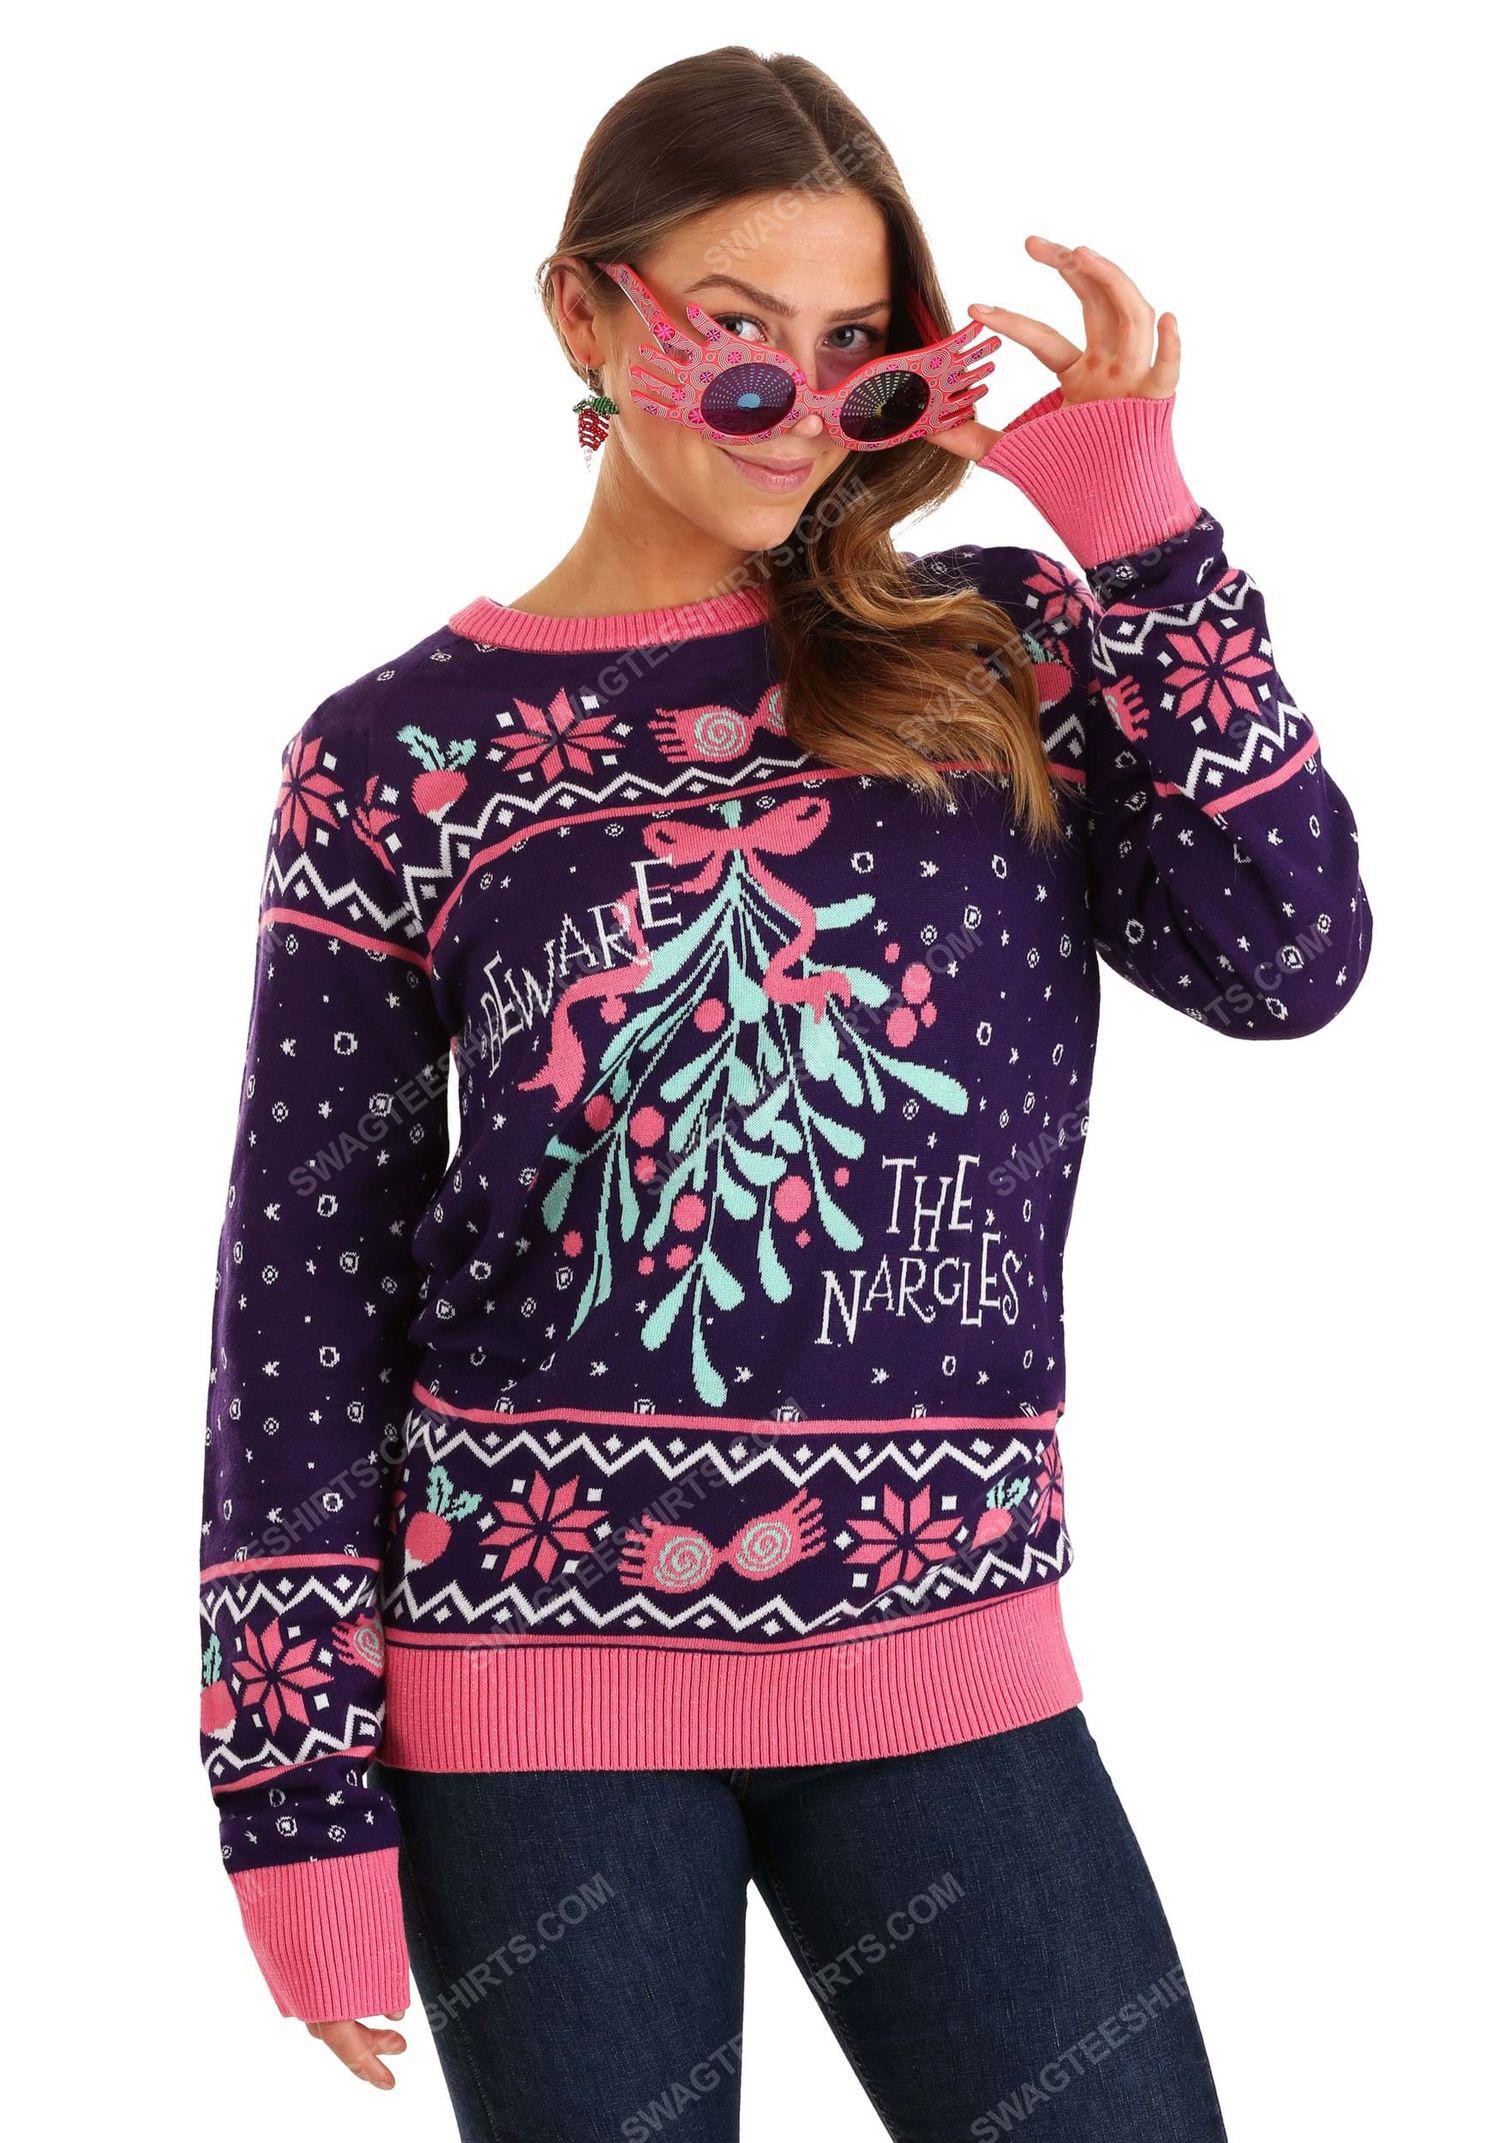 Christmas holiday harry potter luna lovegood full print ugly christmas sweater 2